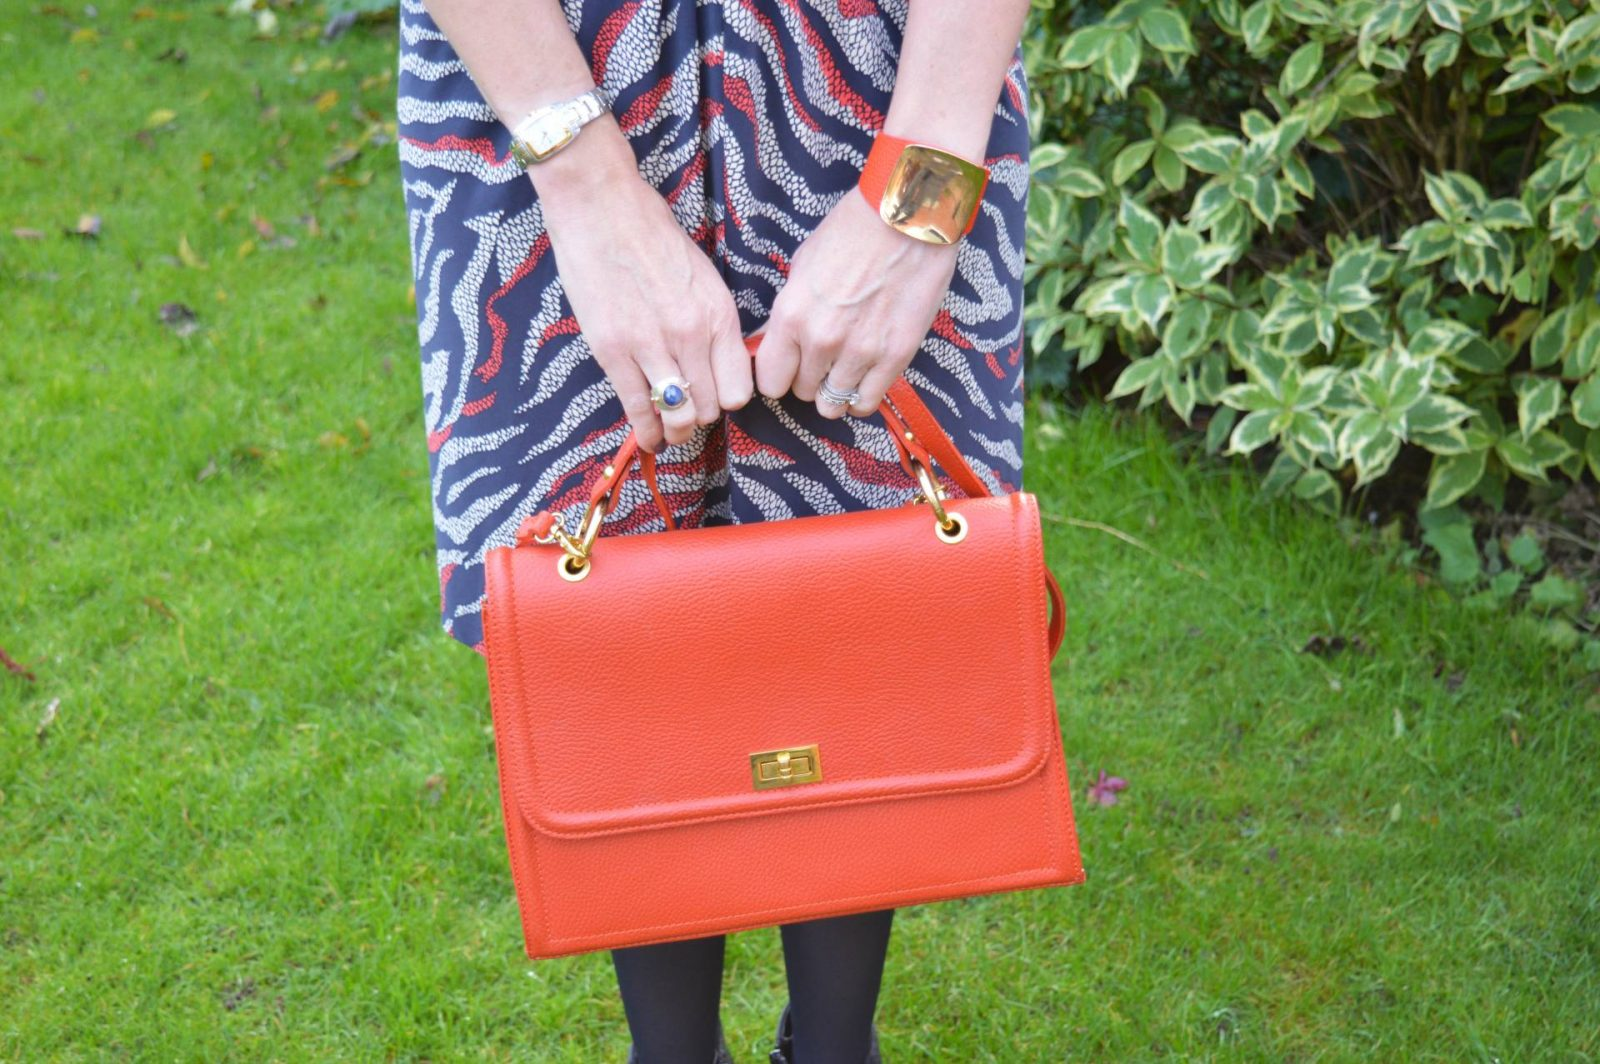 Anne Klein Dress for Less Than a Fiver orange leather bag Mango orange cuff